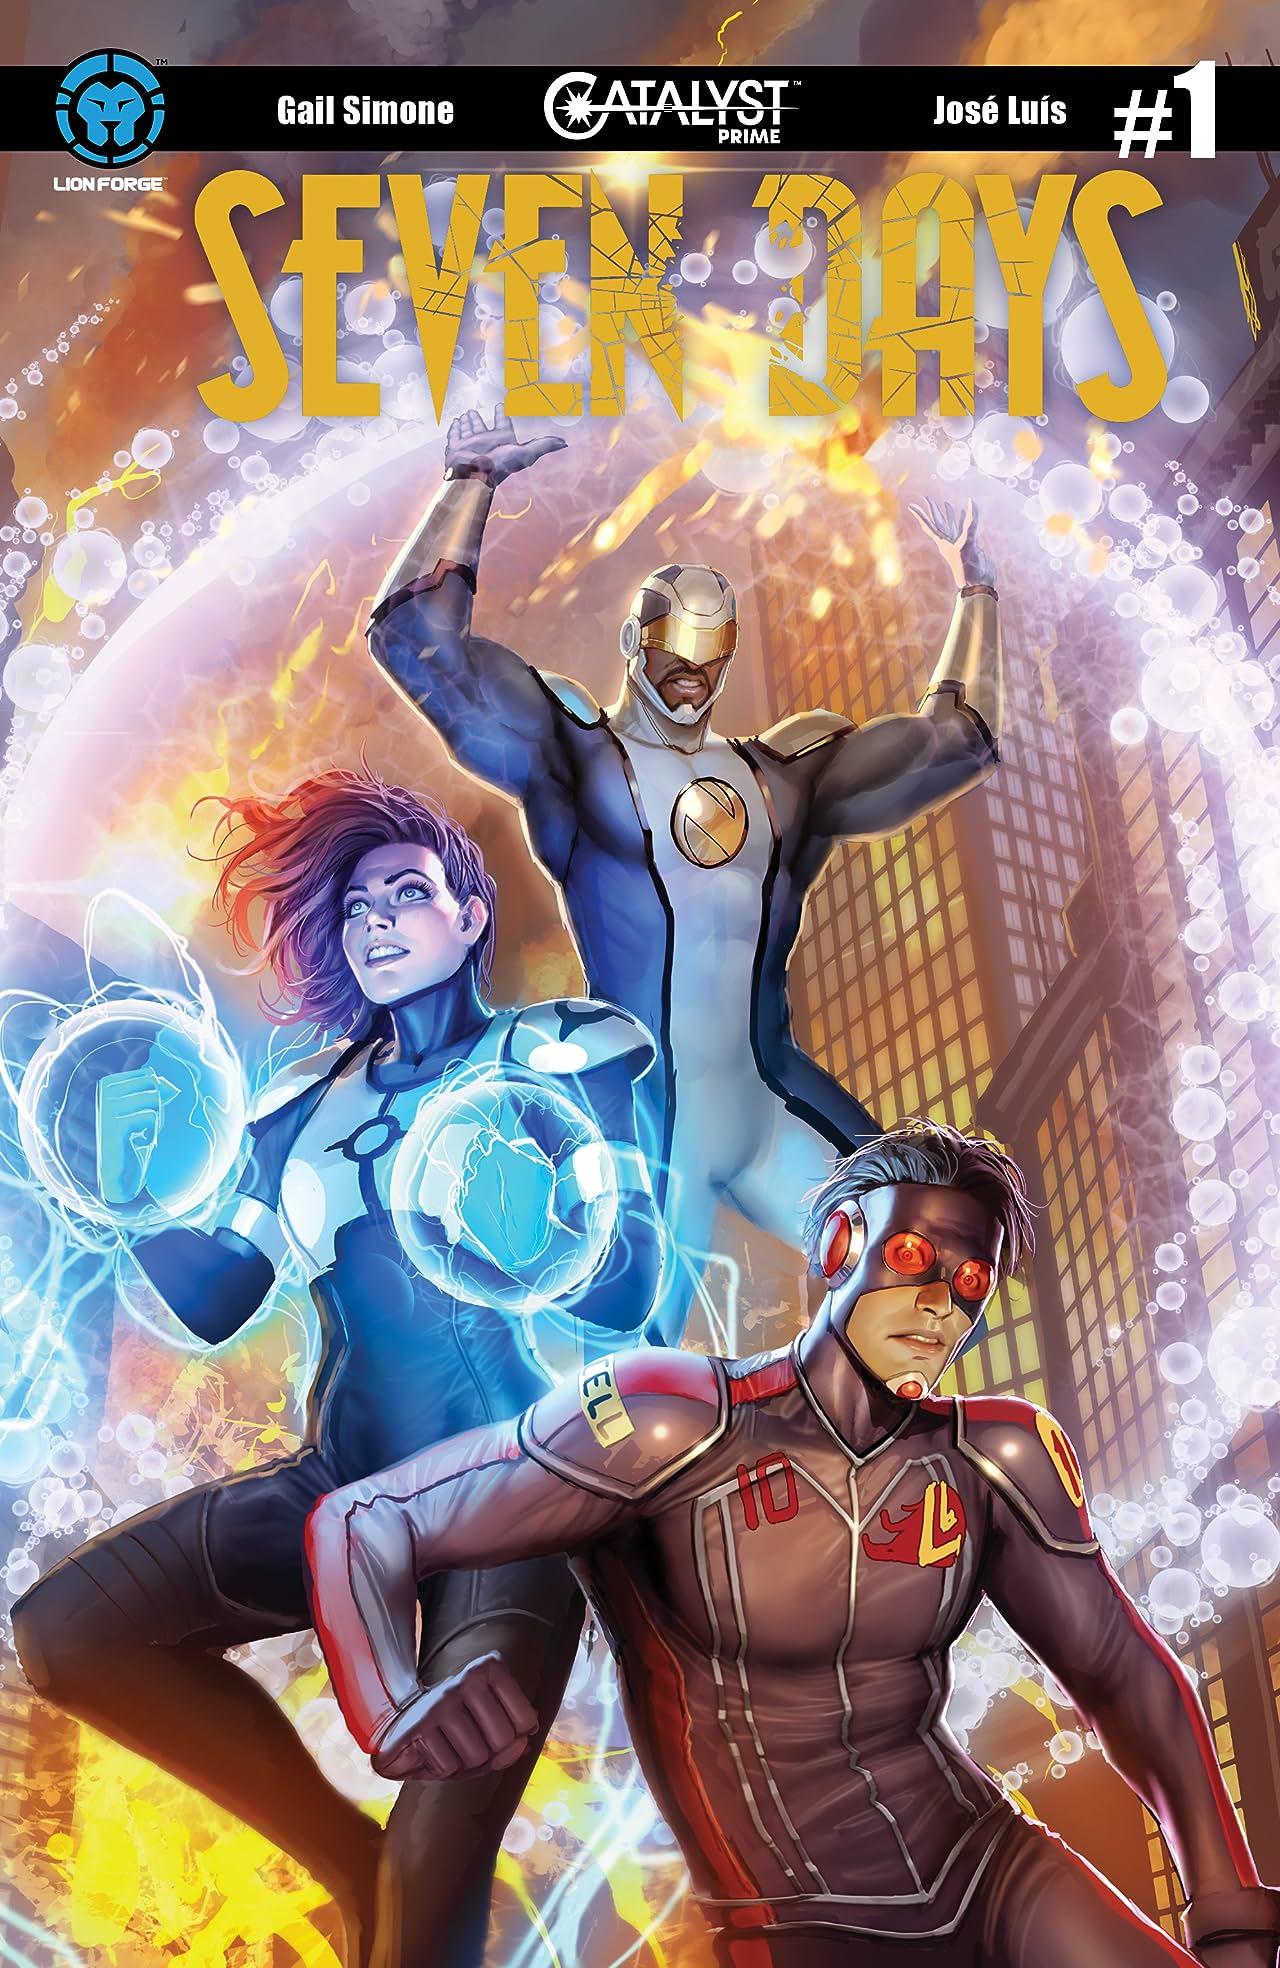 Catalyst Prime: Seven Days #1